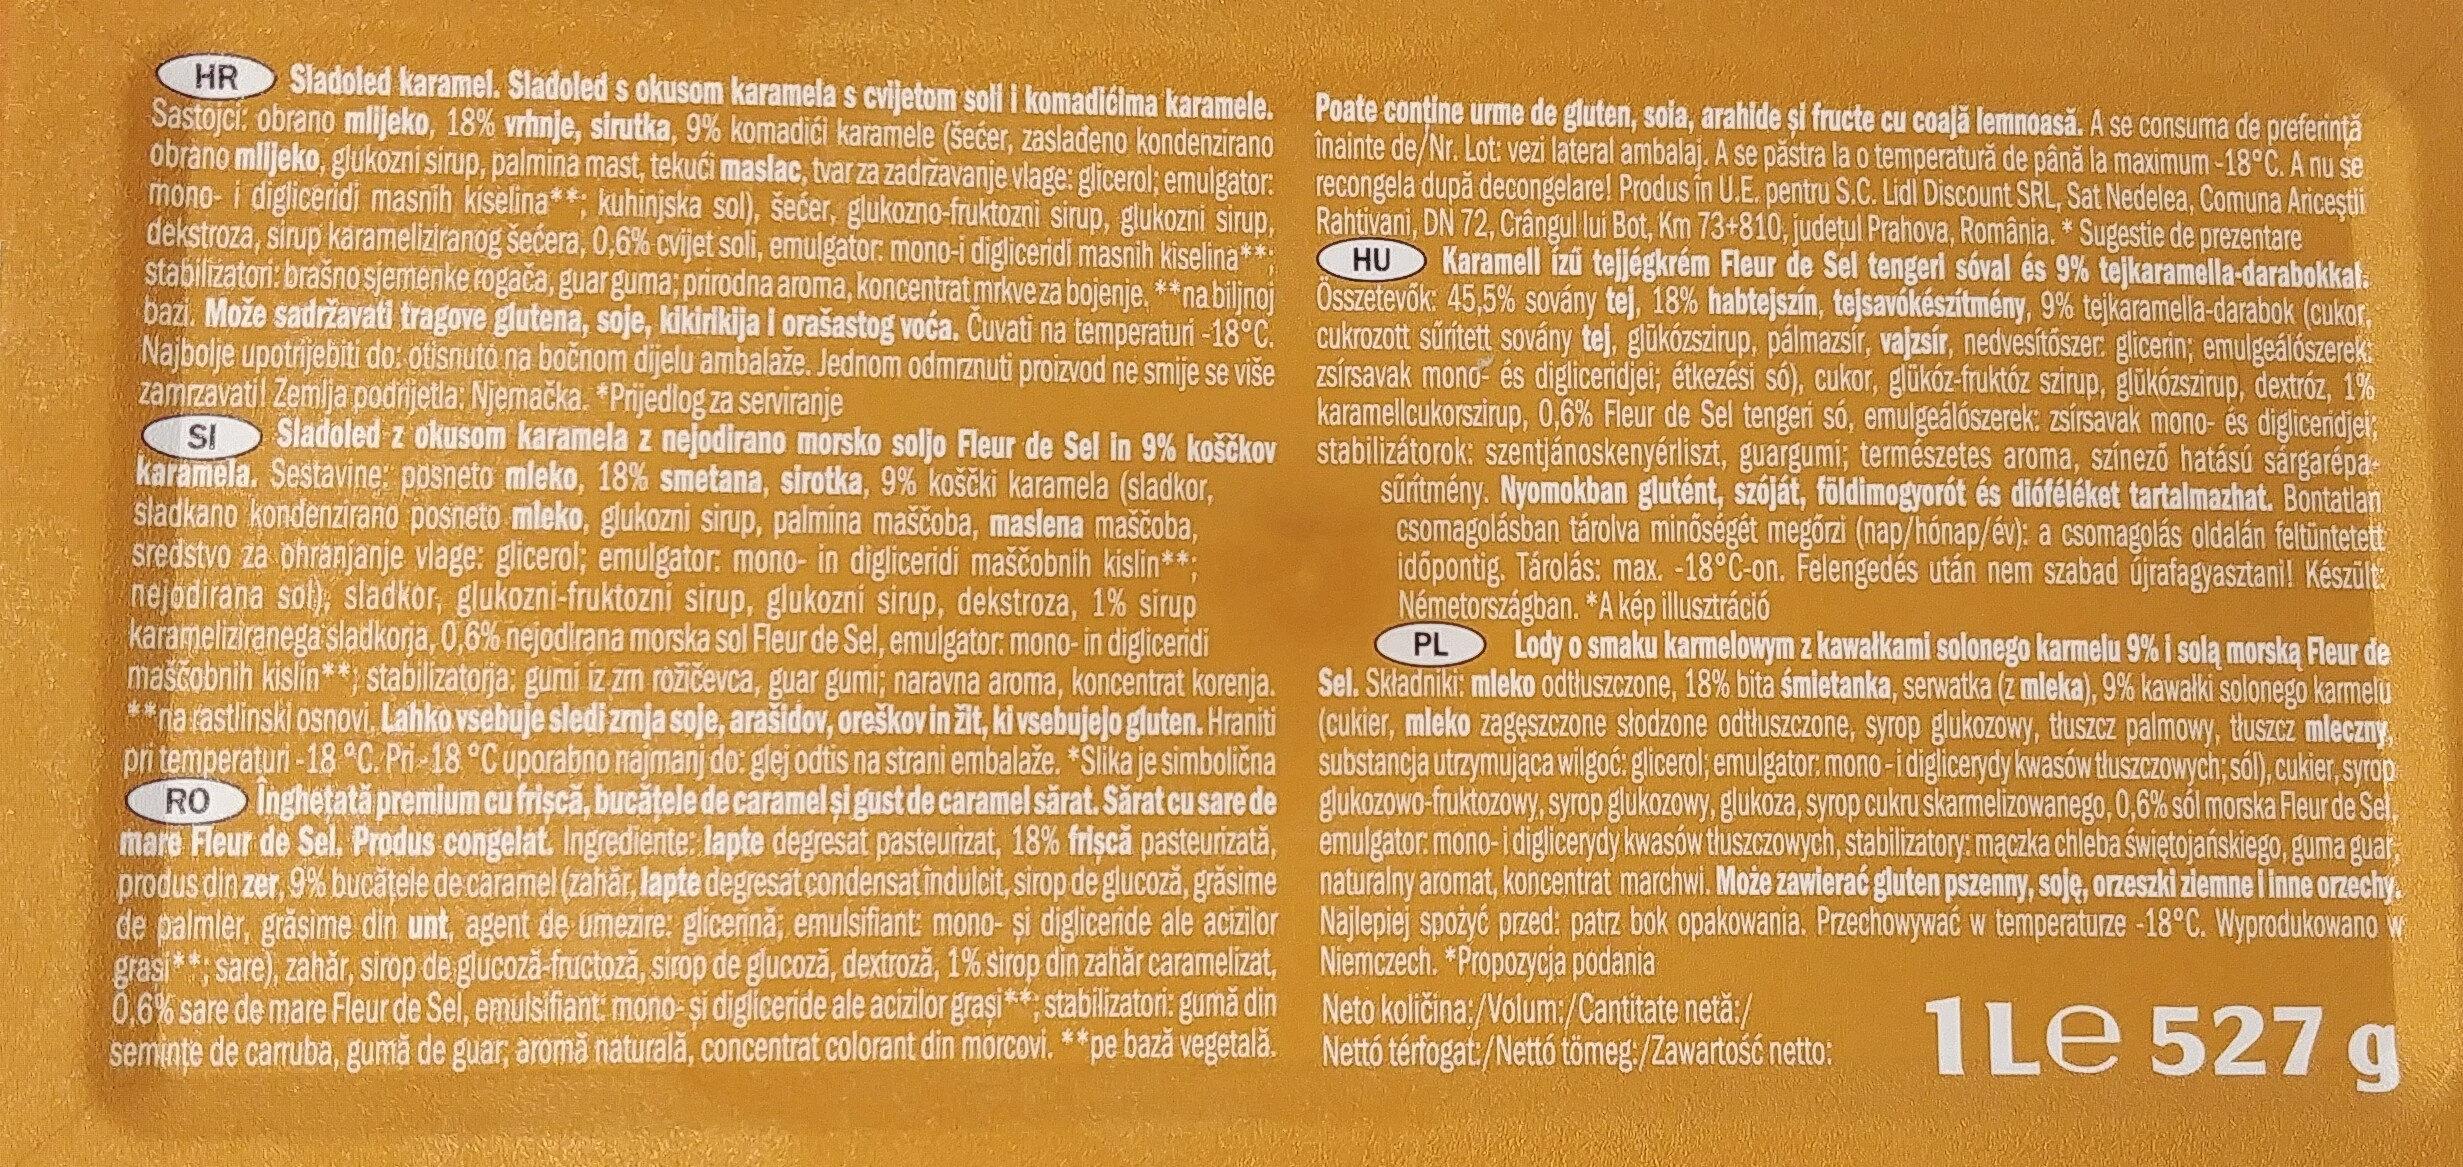 Premium Salted Caramel - Składniki - pl